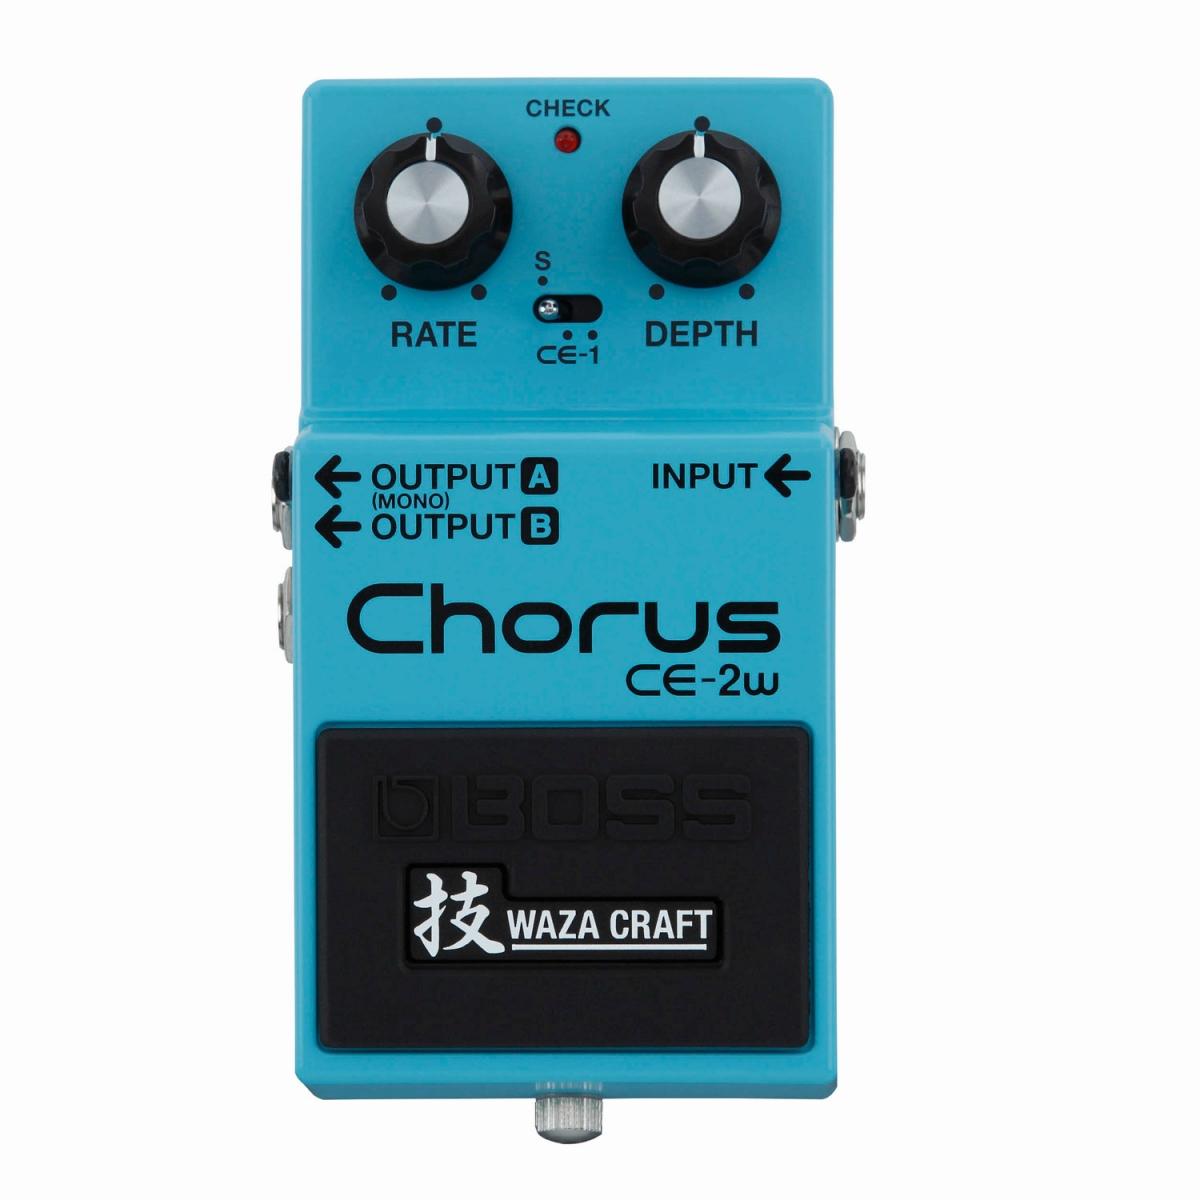 BOSS / 技WAZA CRAFT CE-2W Chorus ボス 【WEBSHOP】【YRK】《9Vマンガン電池2個プレゼント!/+681215700×2》